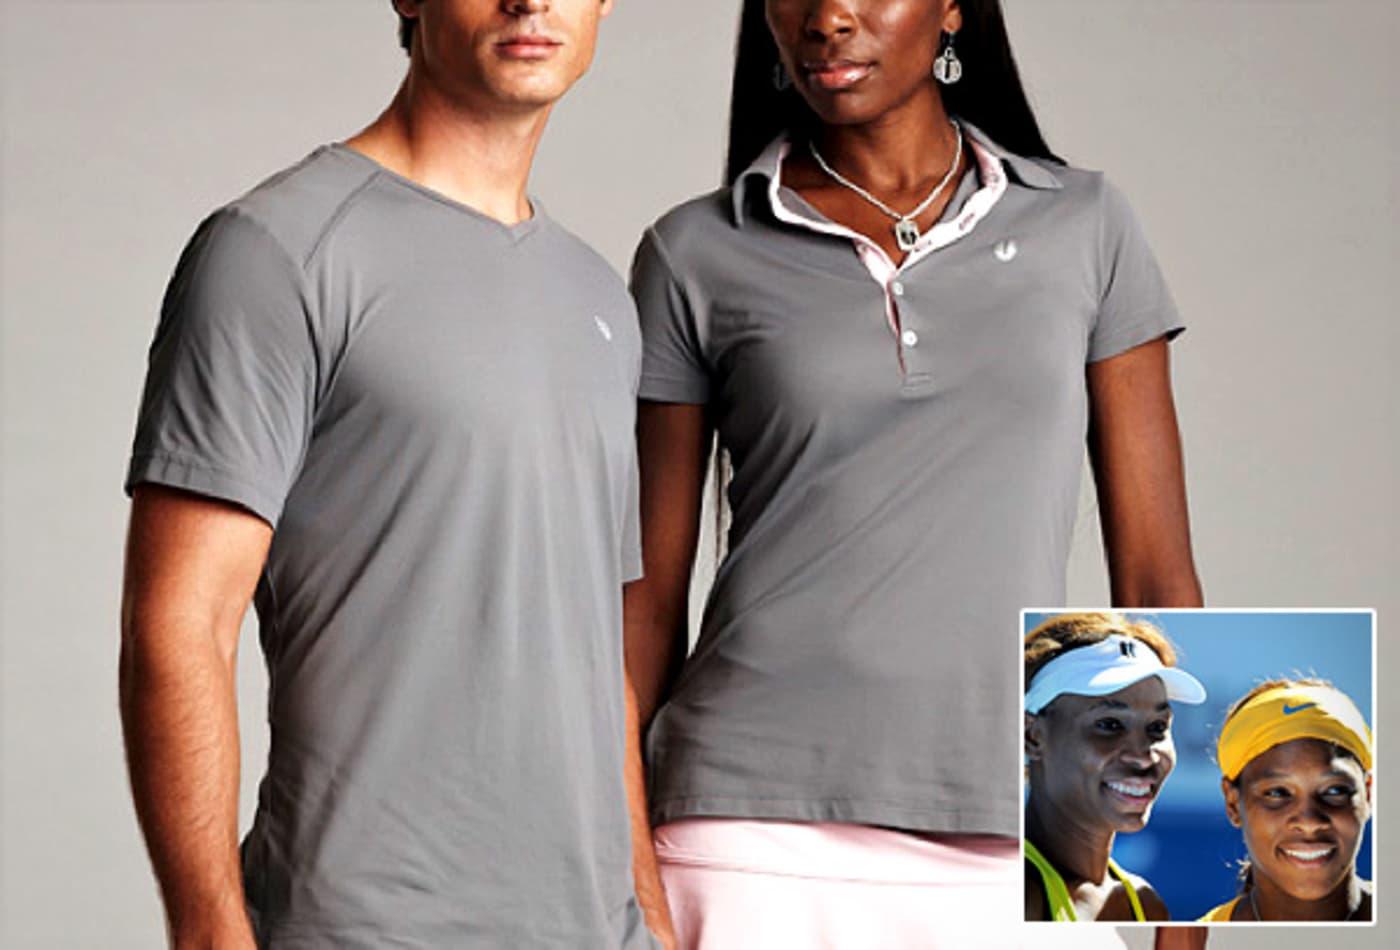 Venus-Serena-Williams-Athlete-Clothing-Lines-CNBC.jpg